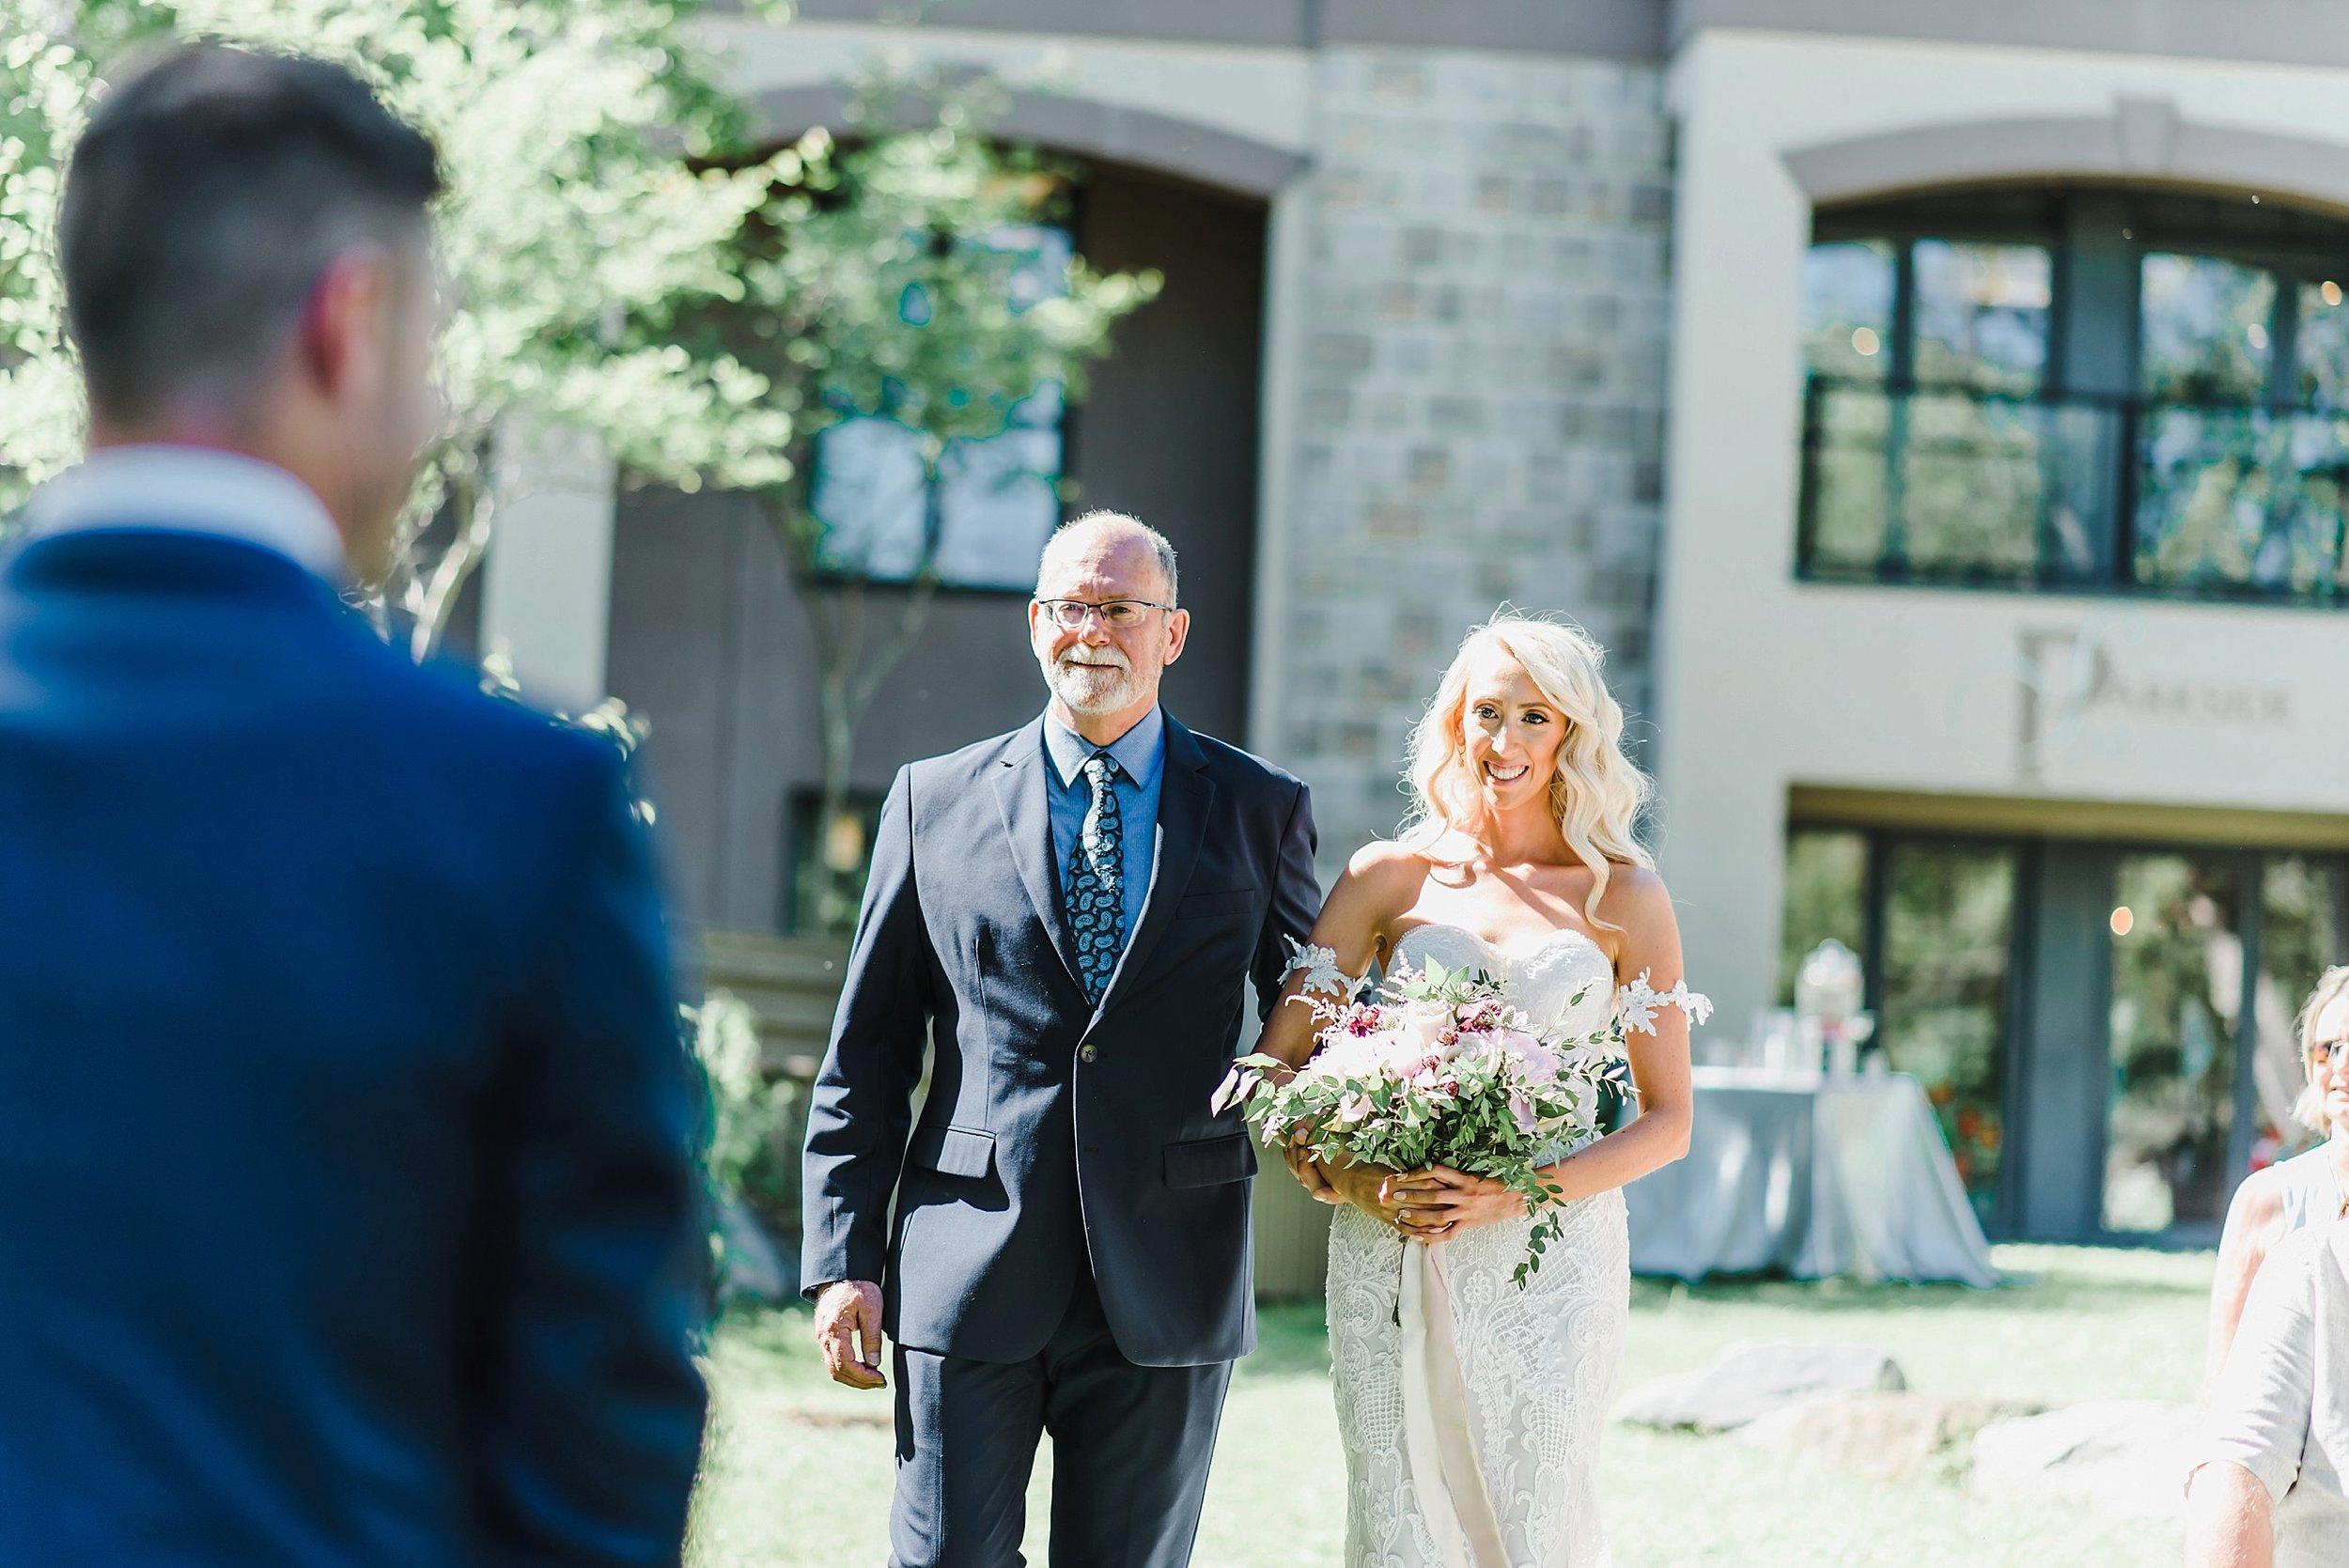 light airy indie fine art ottawa wedding photographer | Ali and Batoul Photography_0062.jpg